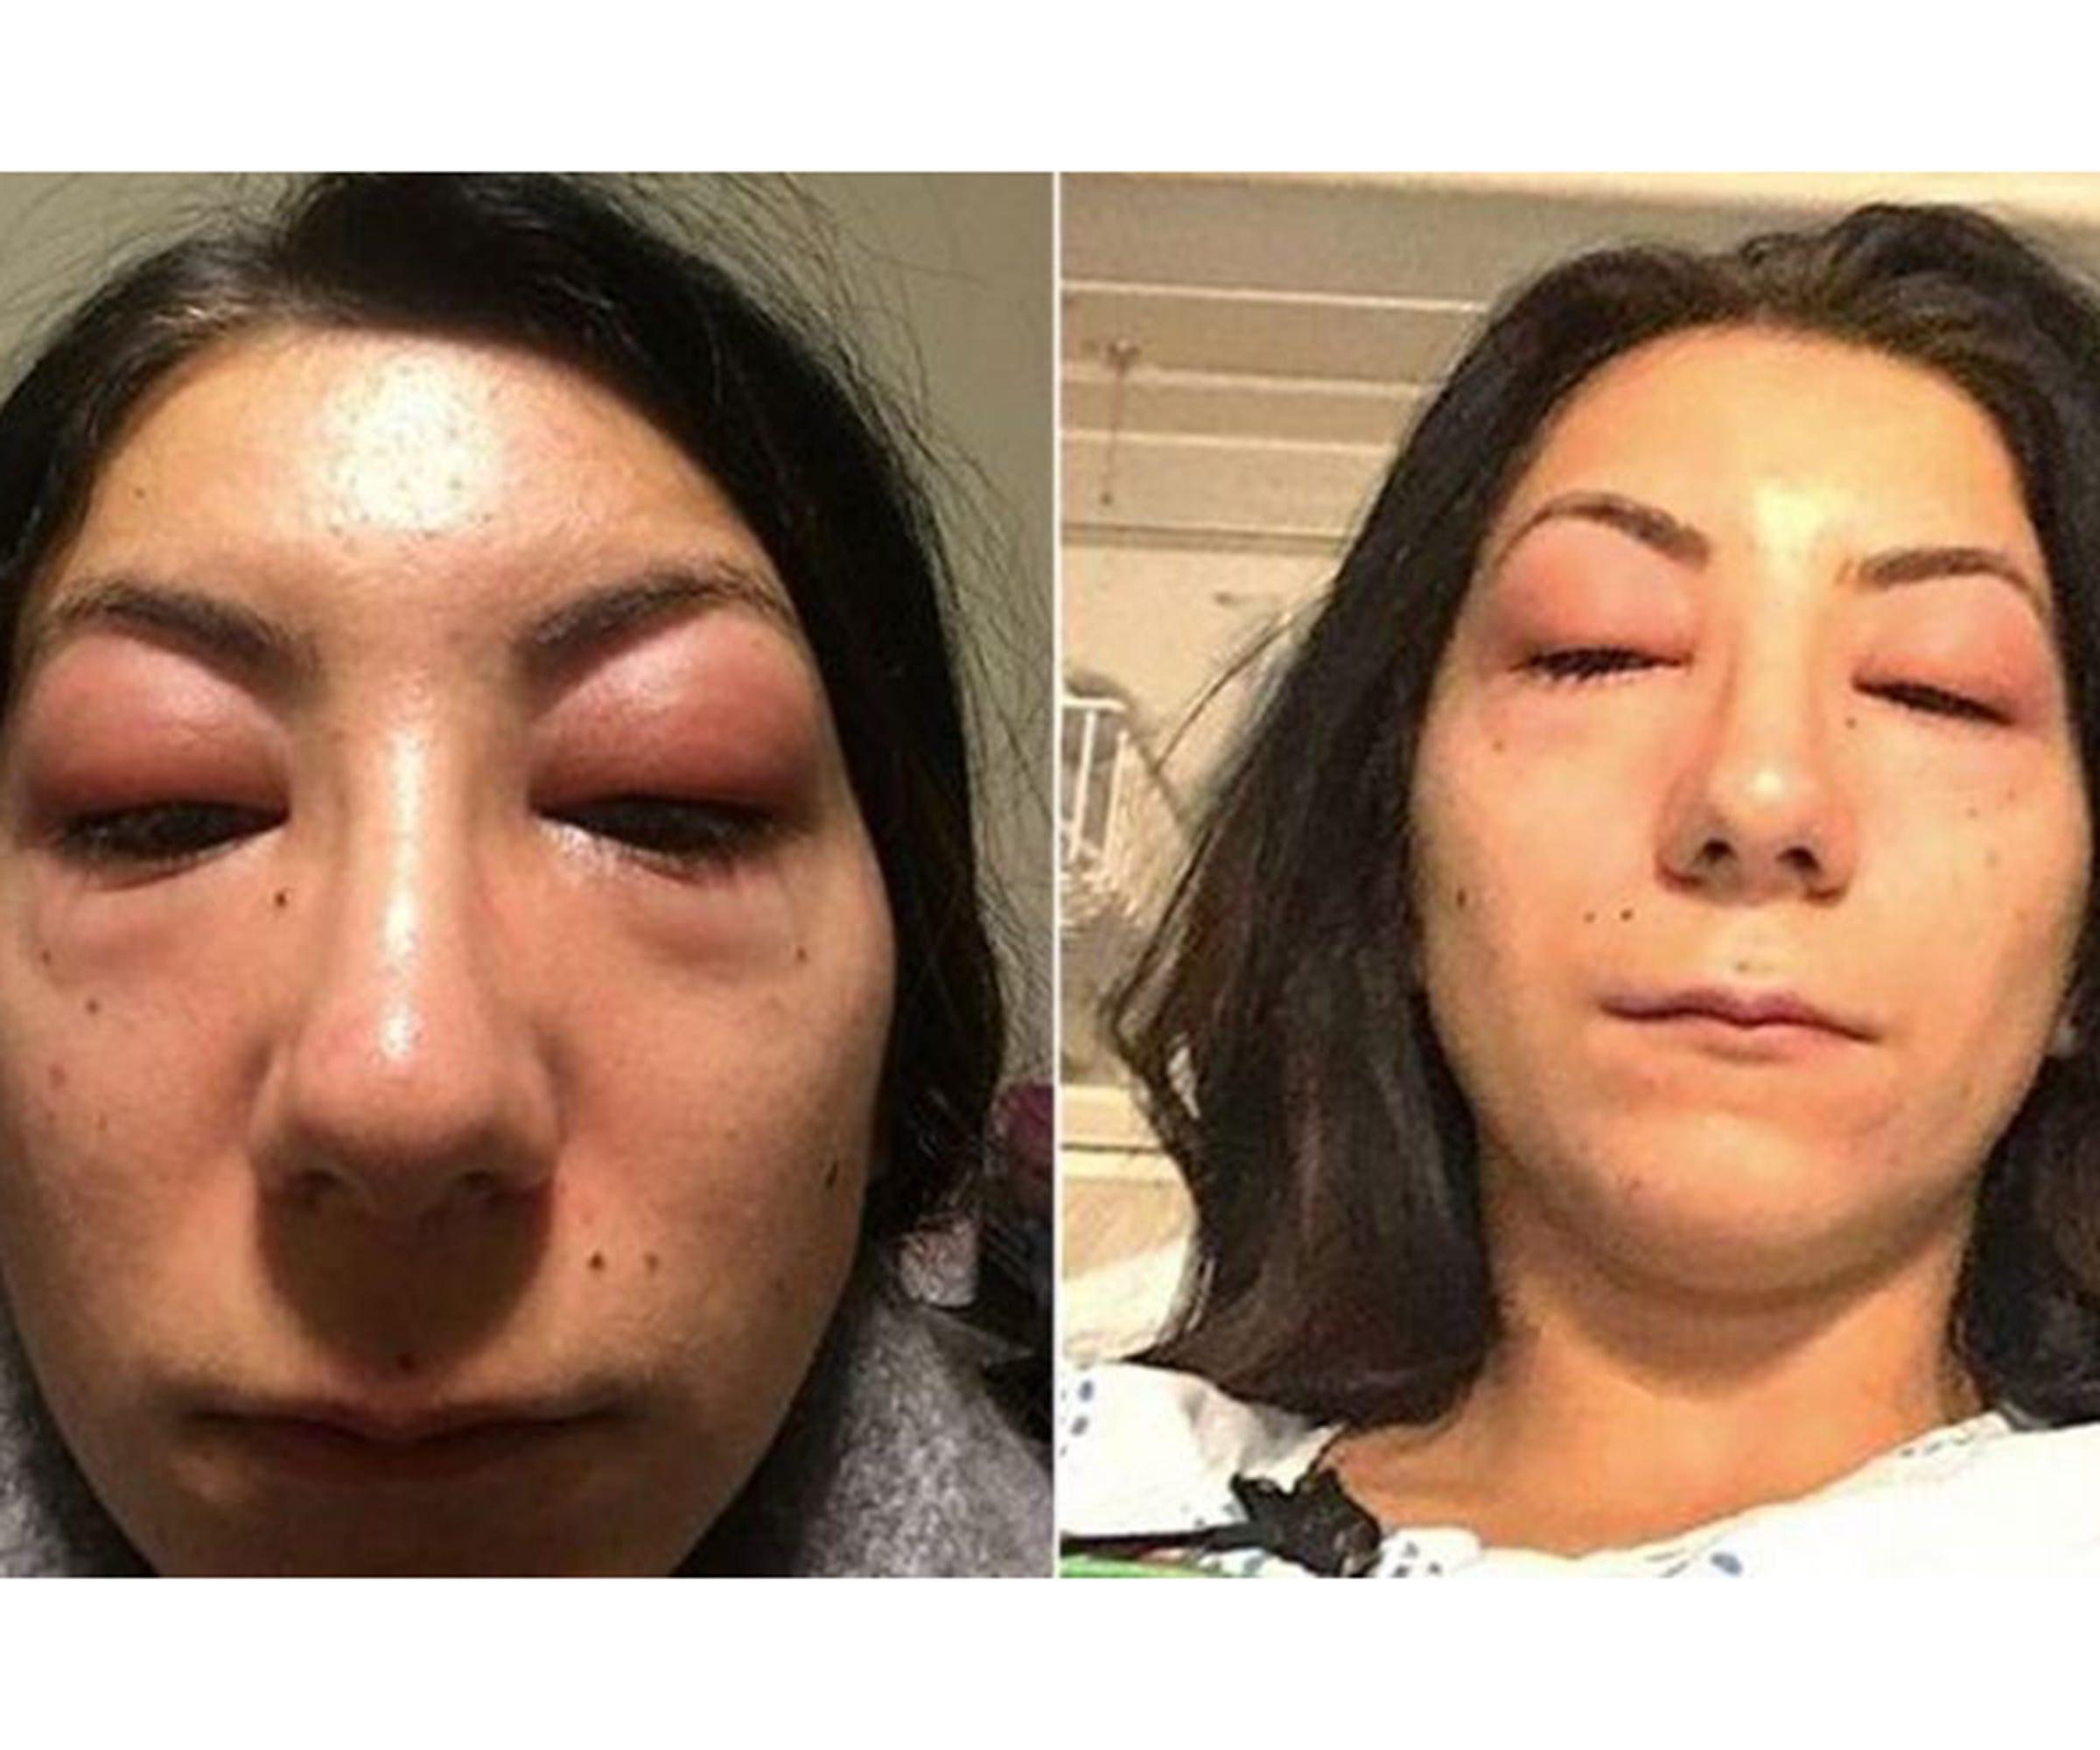 Eyelash Extensions Allergic Reaction Horror Story Photo